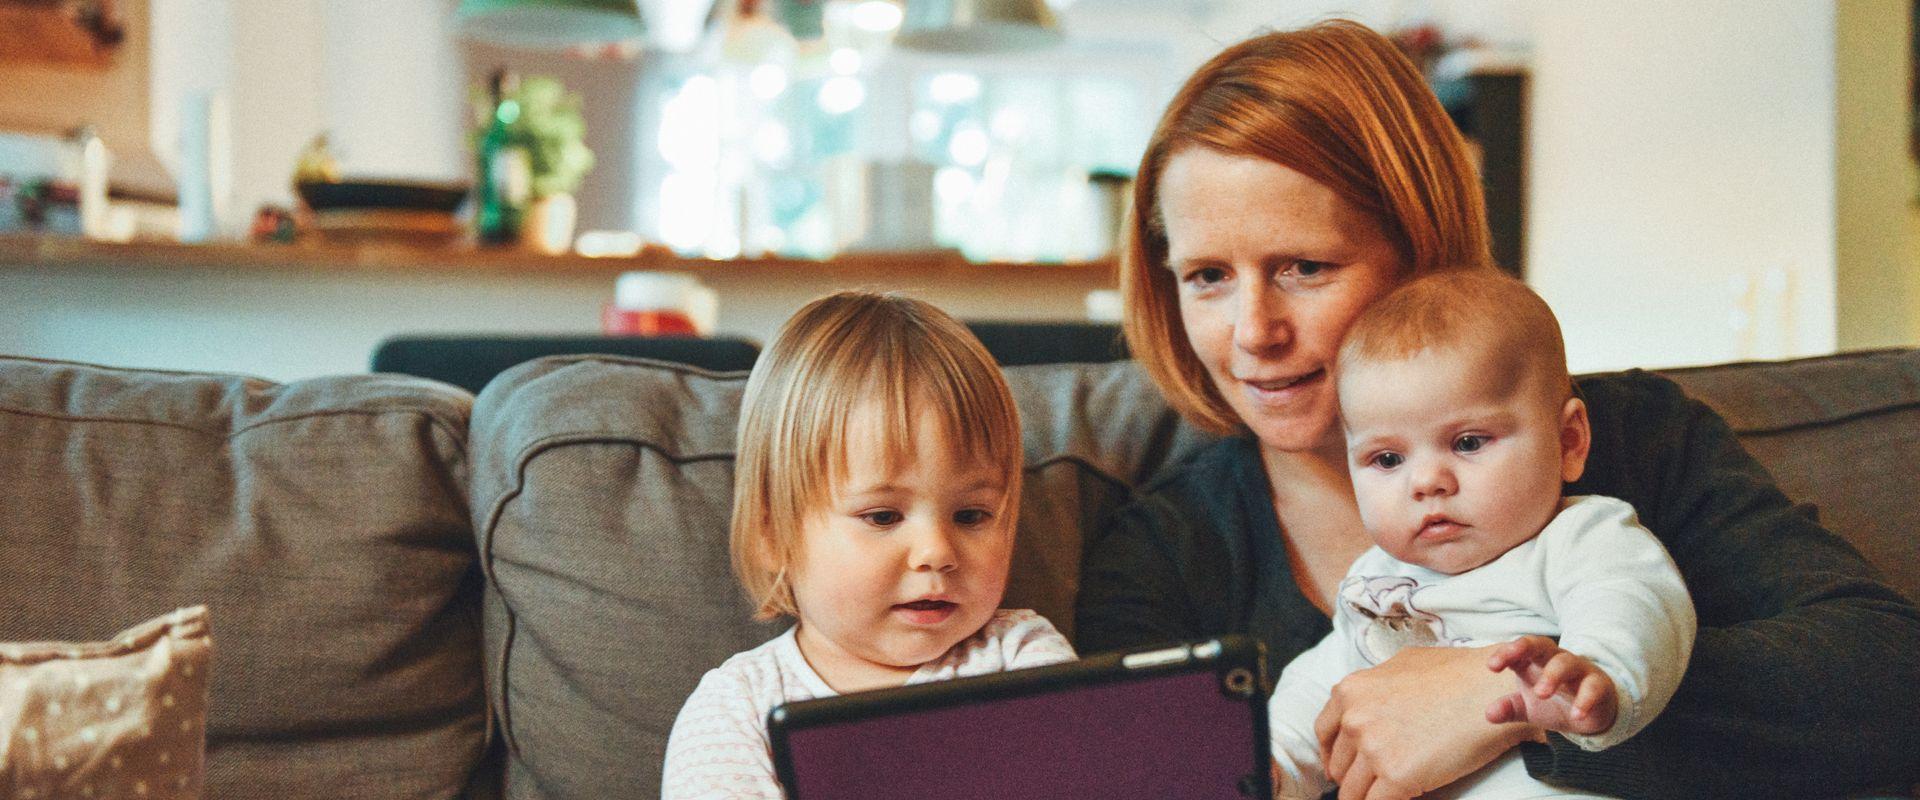 mom with babies and iPad